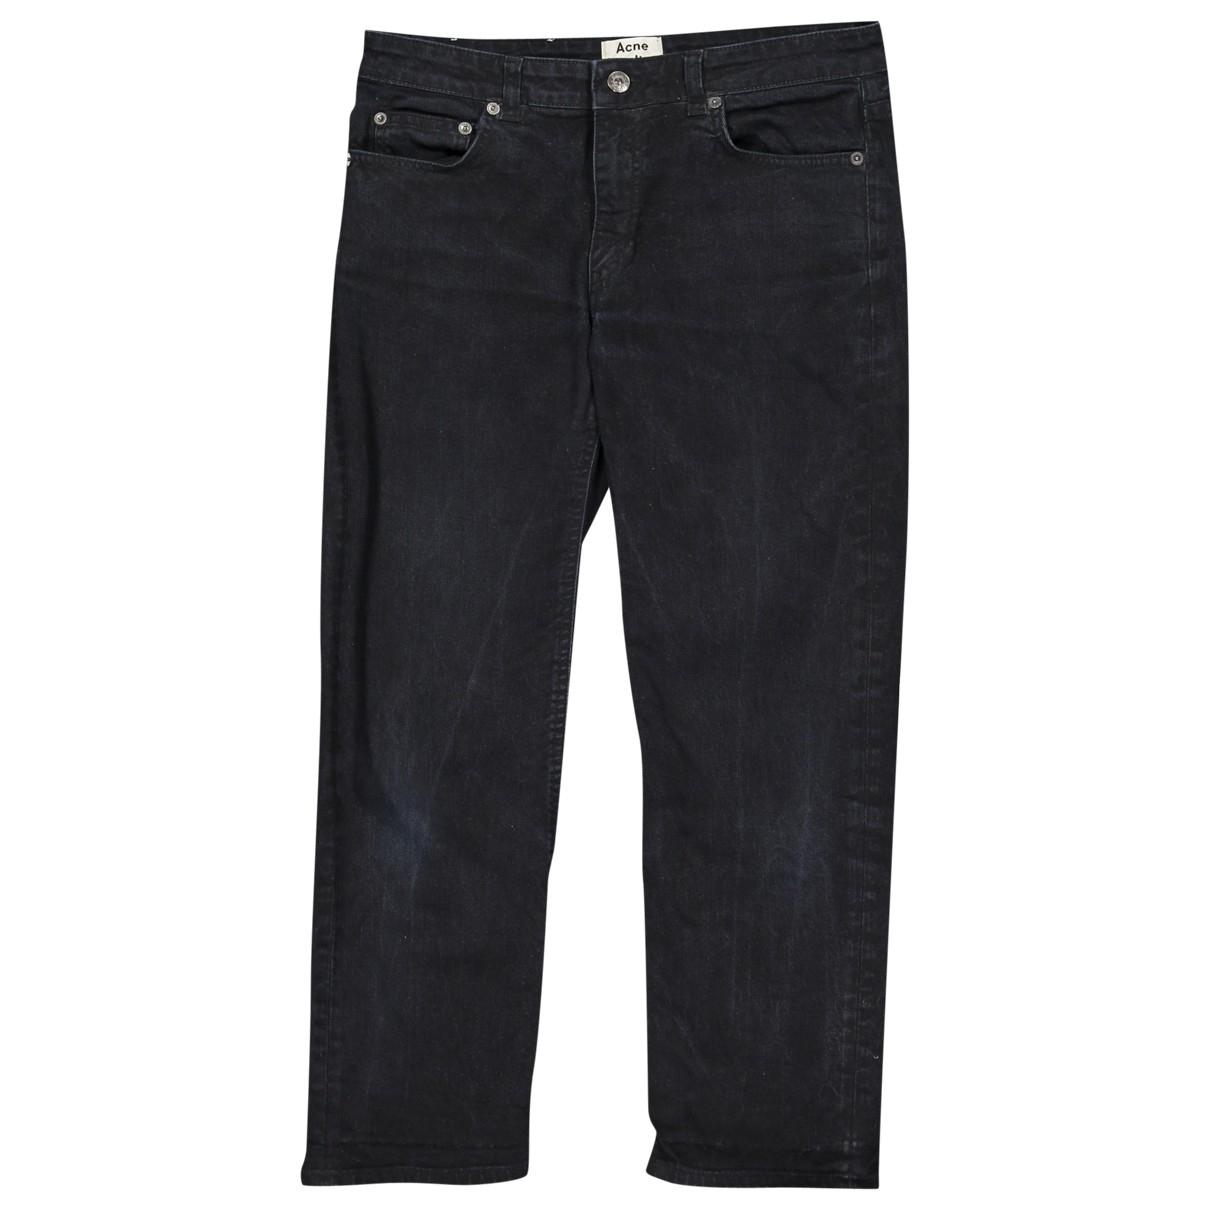 Acne Studios Row Black Cotton - elasthane Jeans for Women 28 US